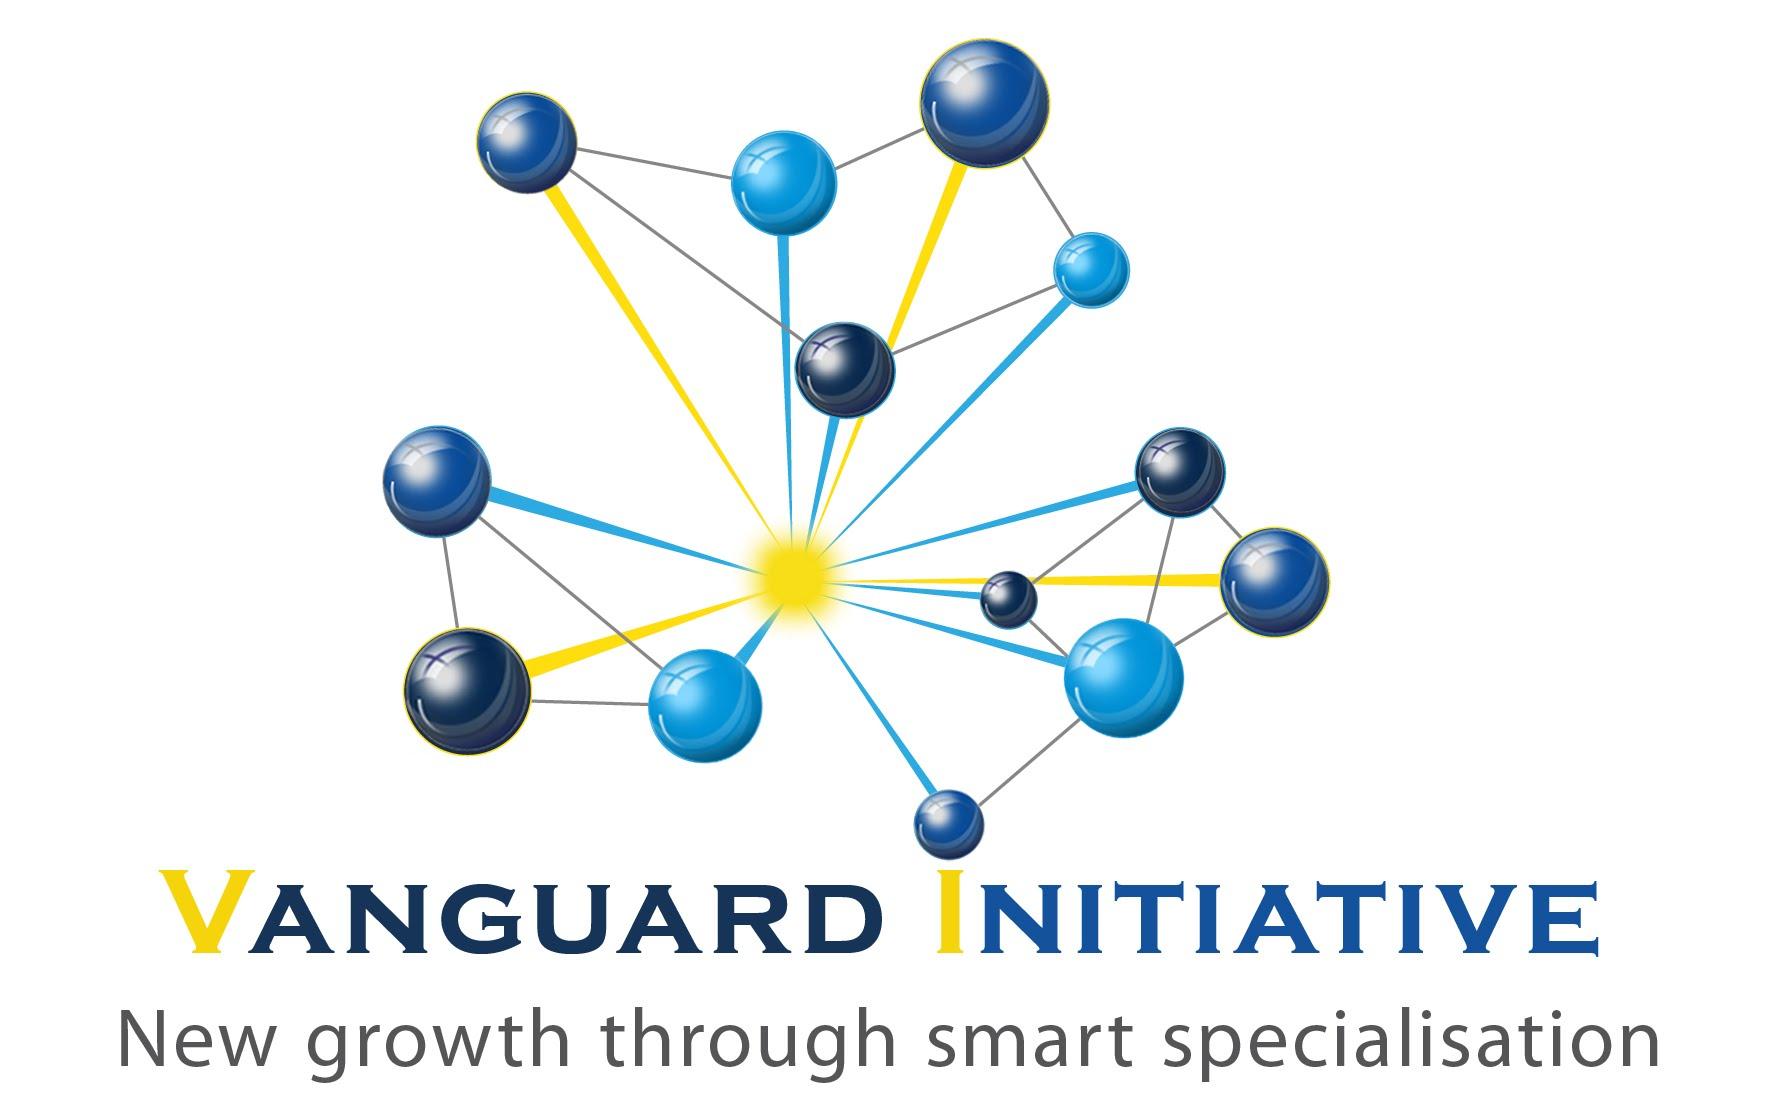 Vanguard Initiative